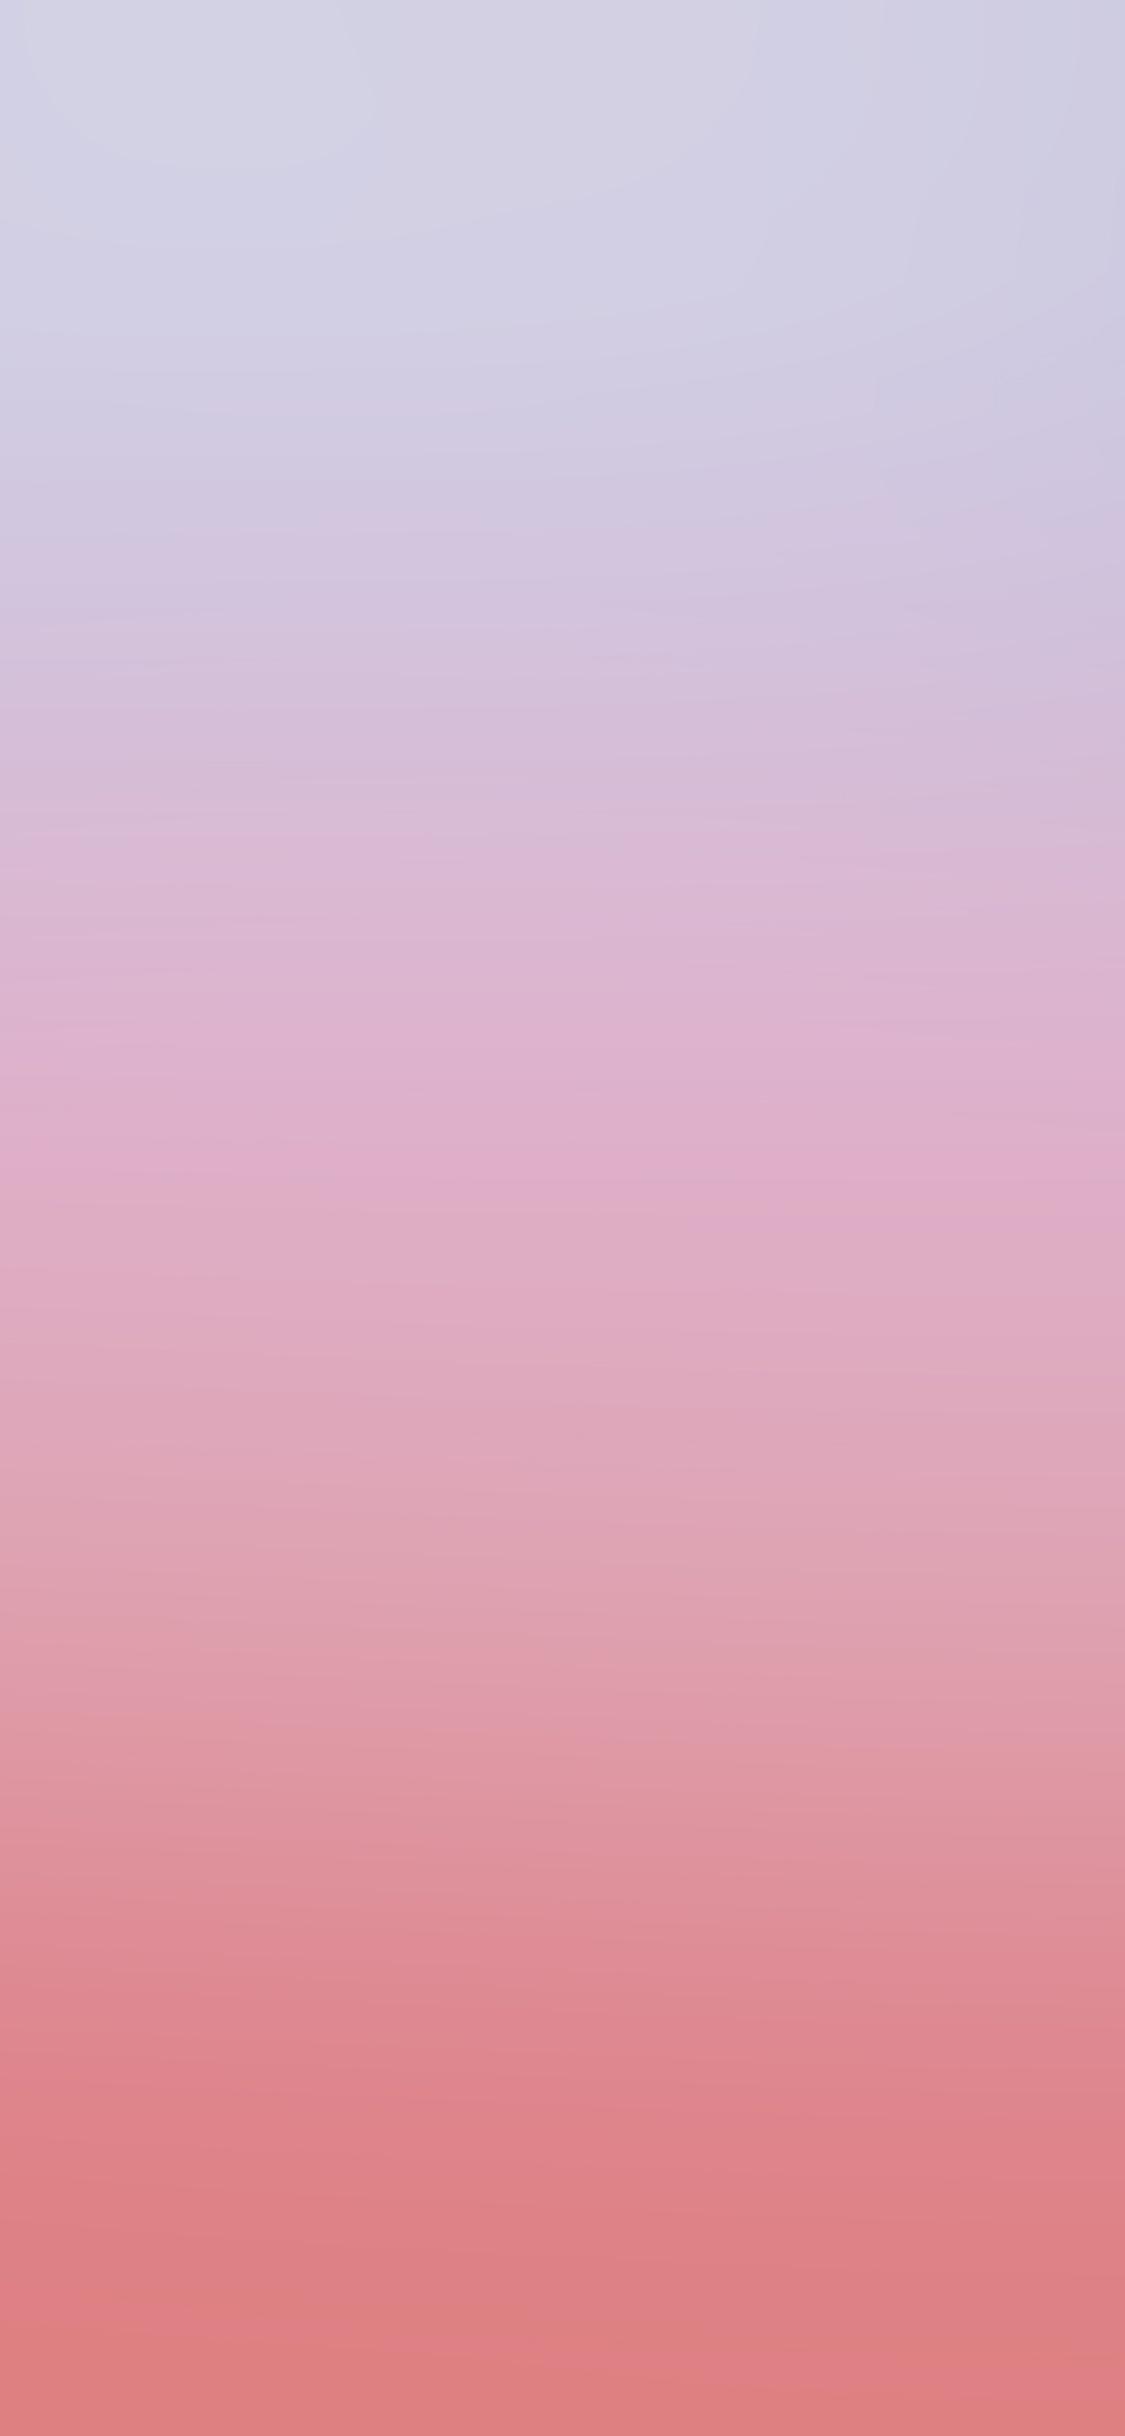 iPhoneXpapers.com-Apple-iPhone-wallpaper-sl70-pink-purple-blur-gradation